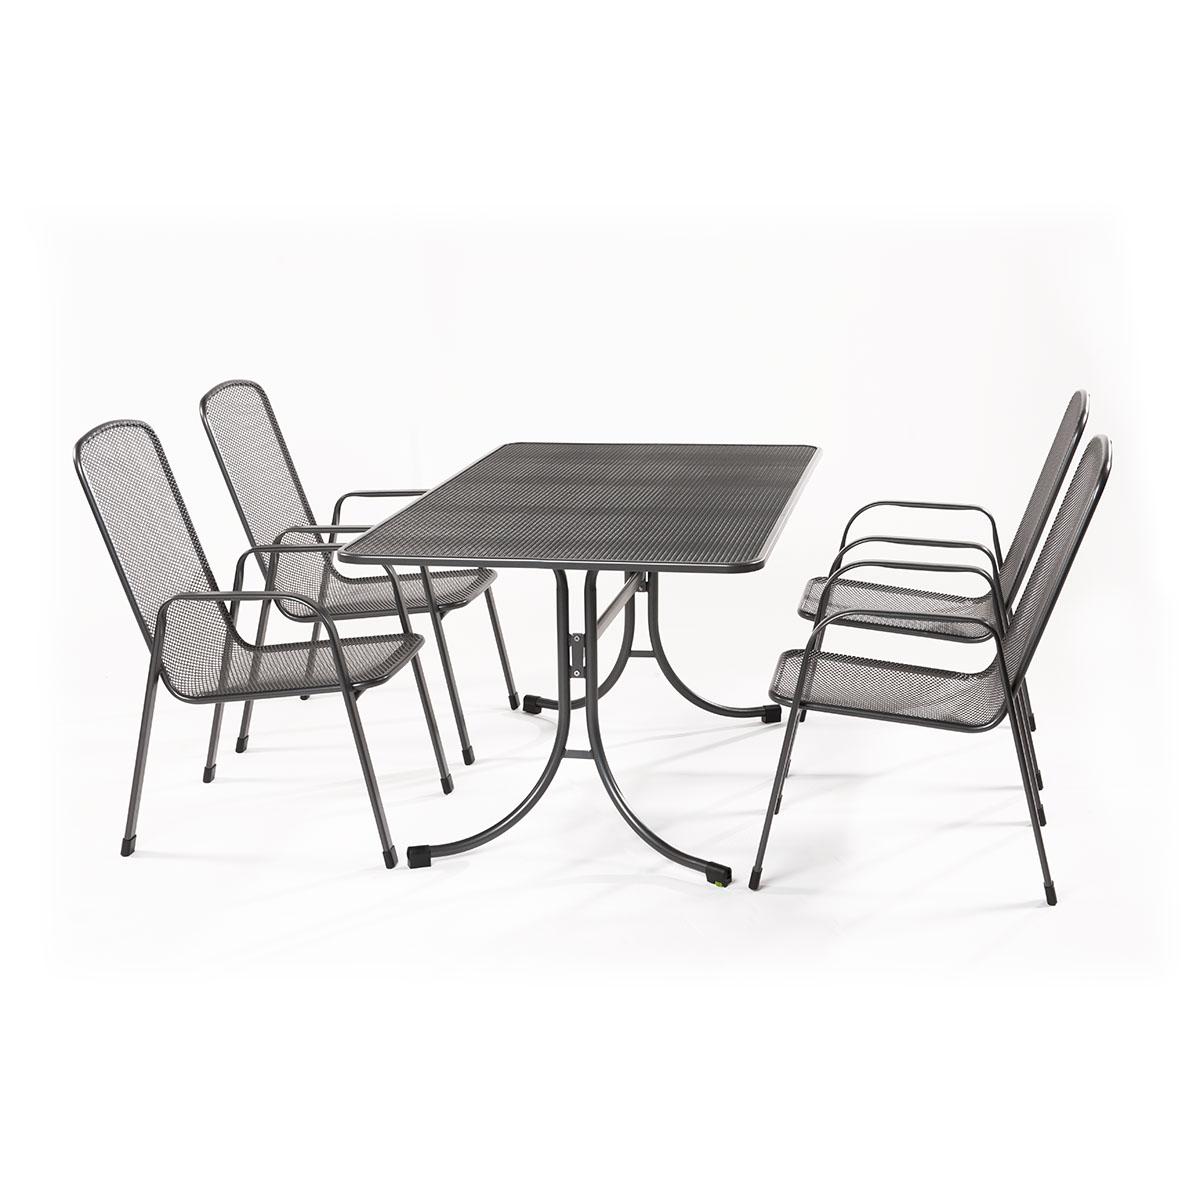 sestava nábytku z tahokovu (4x židle Savoy Basic, 1x stůl Universal 145) MWH Bani 4+